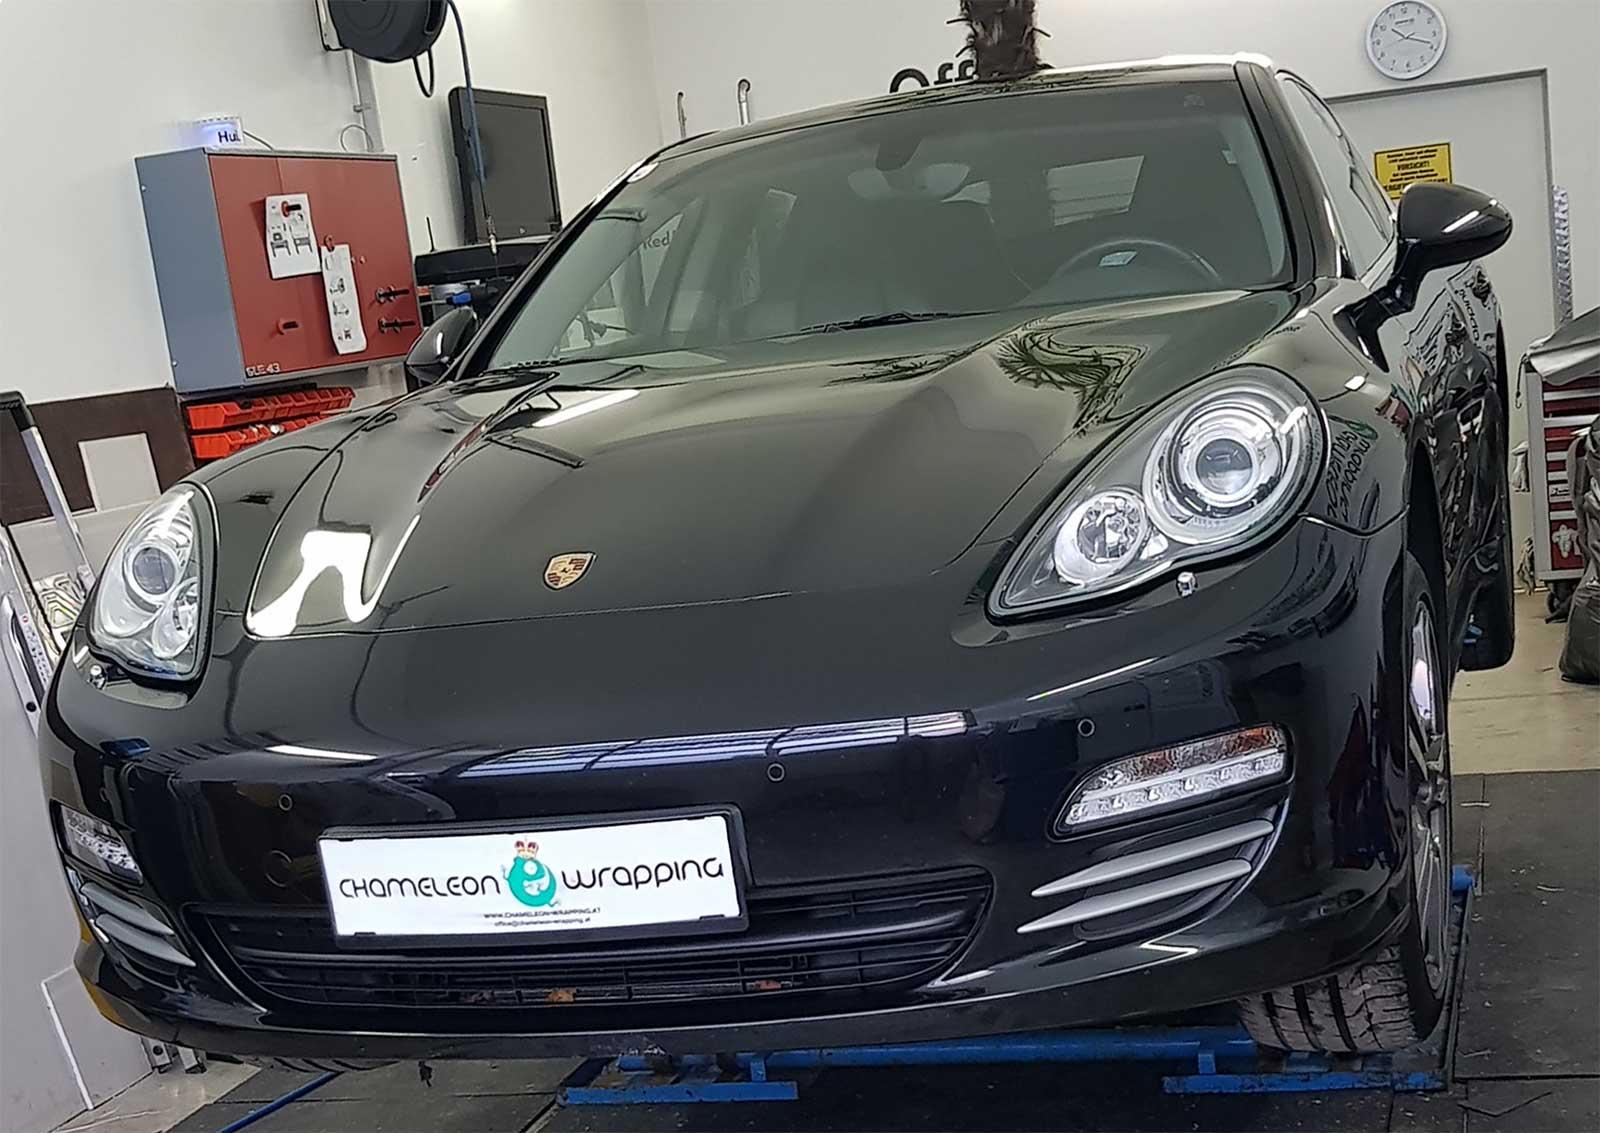 Fahrzeuge folieren Chameleon Wrapping Company Eben im Pongau Salzburg Car wrapping